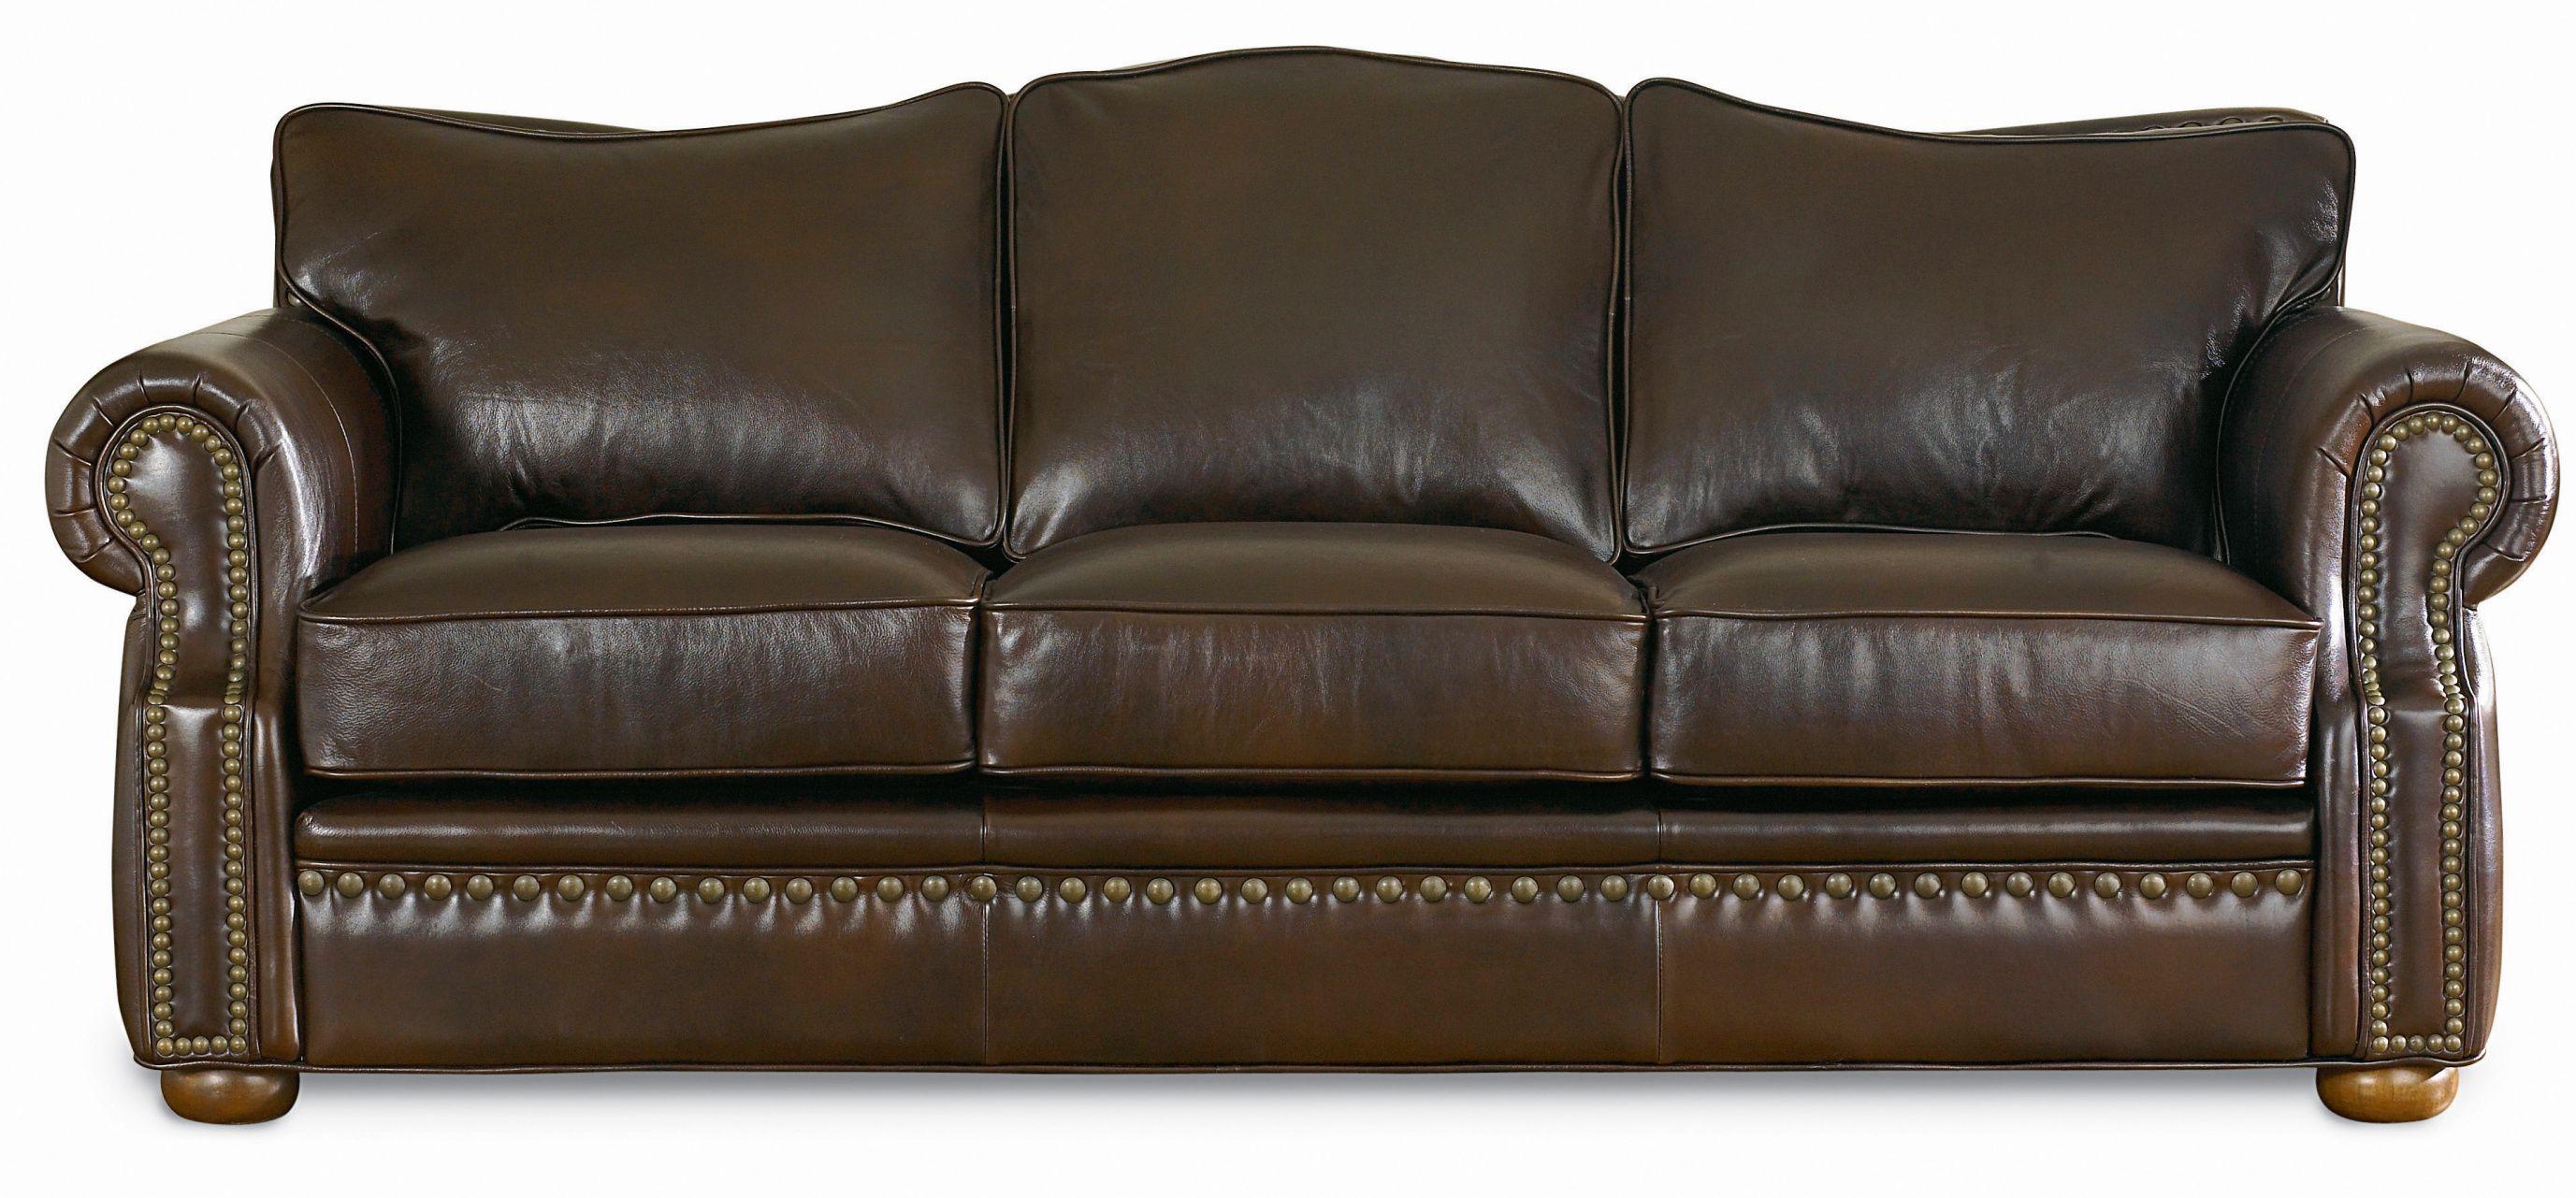 Choice Leather Furniture 1027 NE Loop 410, San Antonio, TX ...